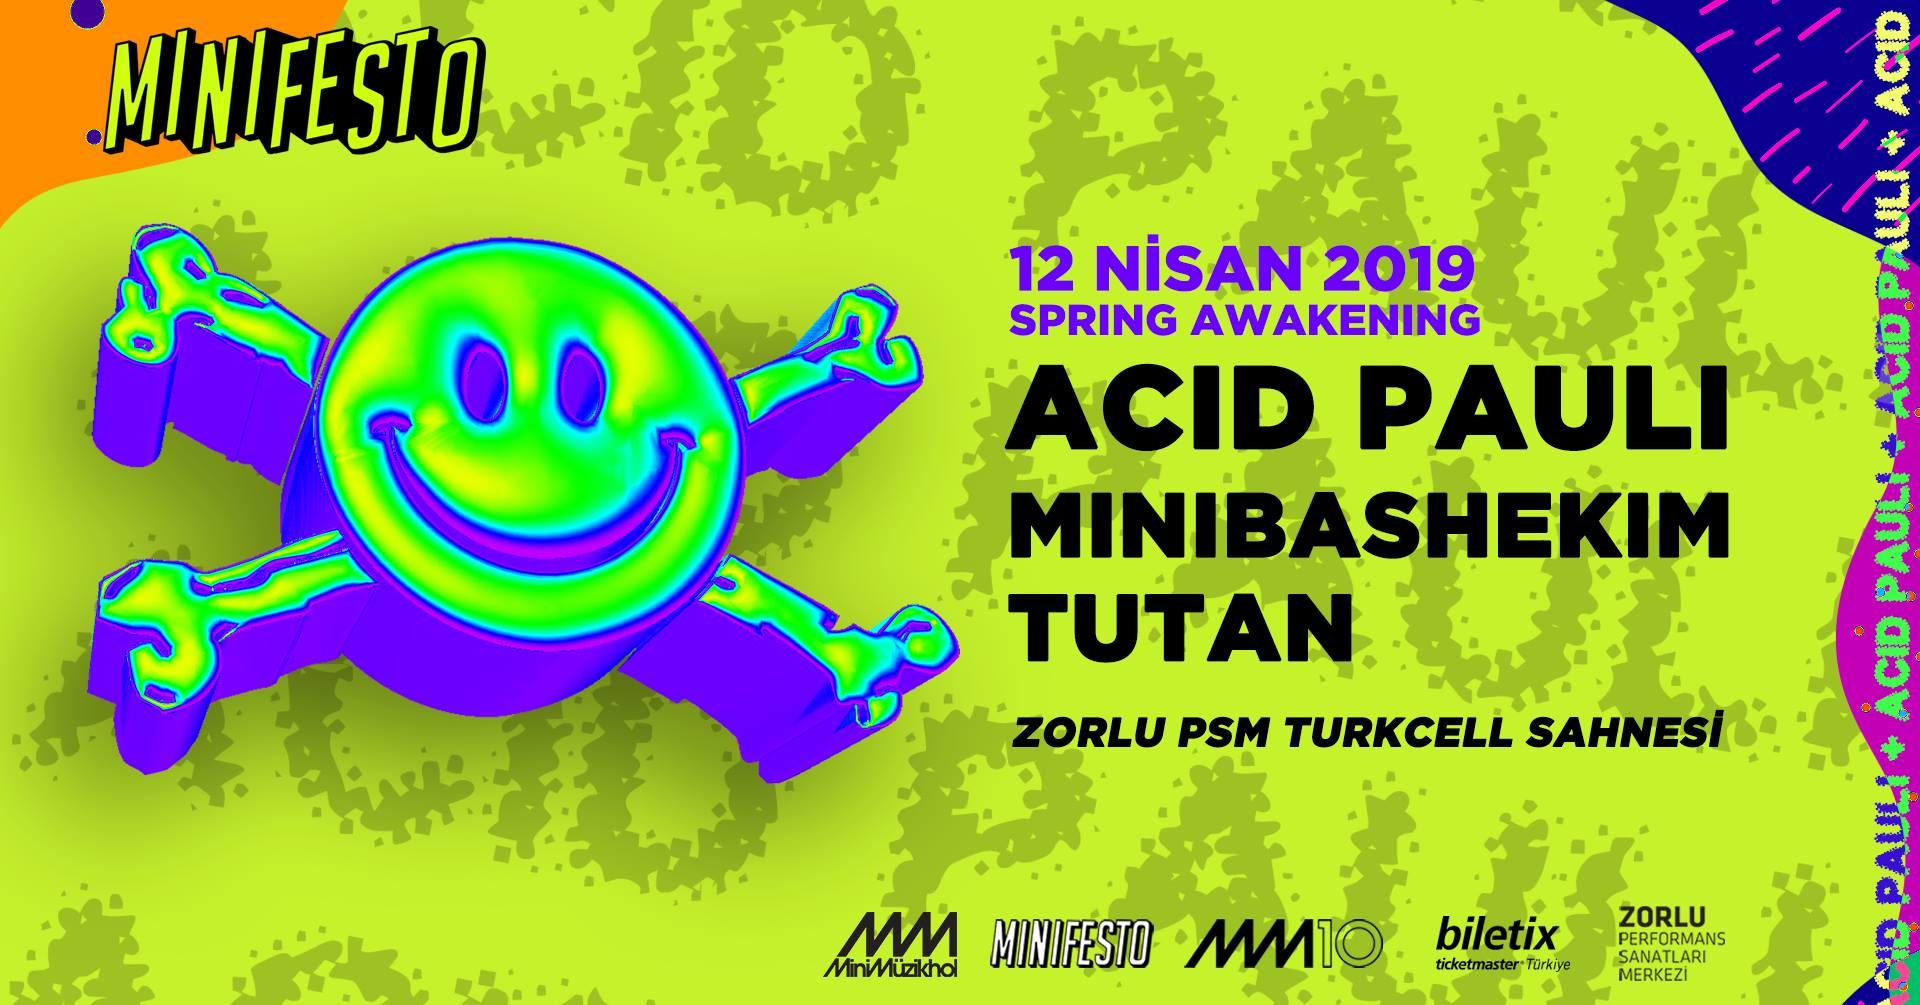 Minifesto: Acid Pauli, 12 Nisan Cuma, Zorlu PSM